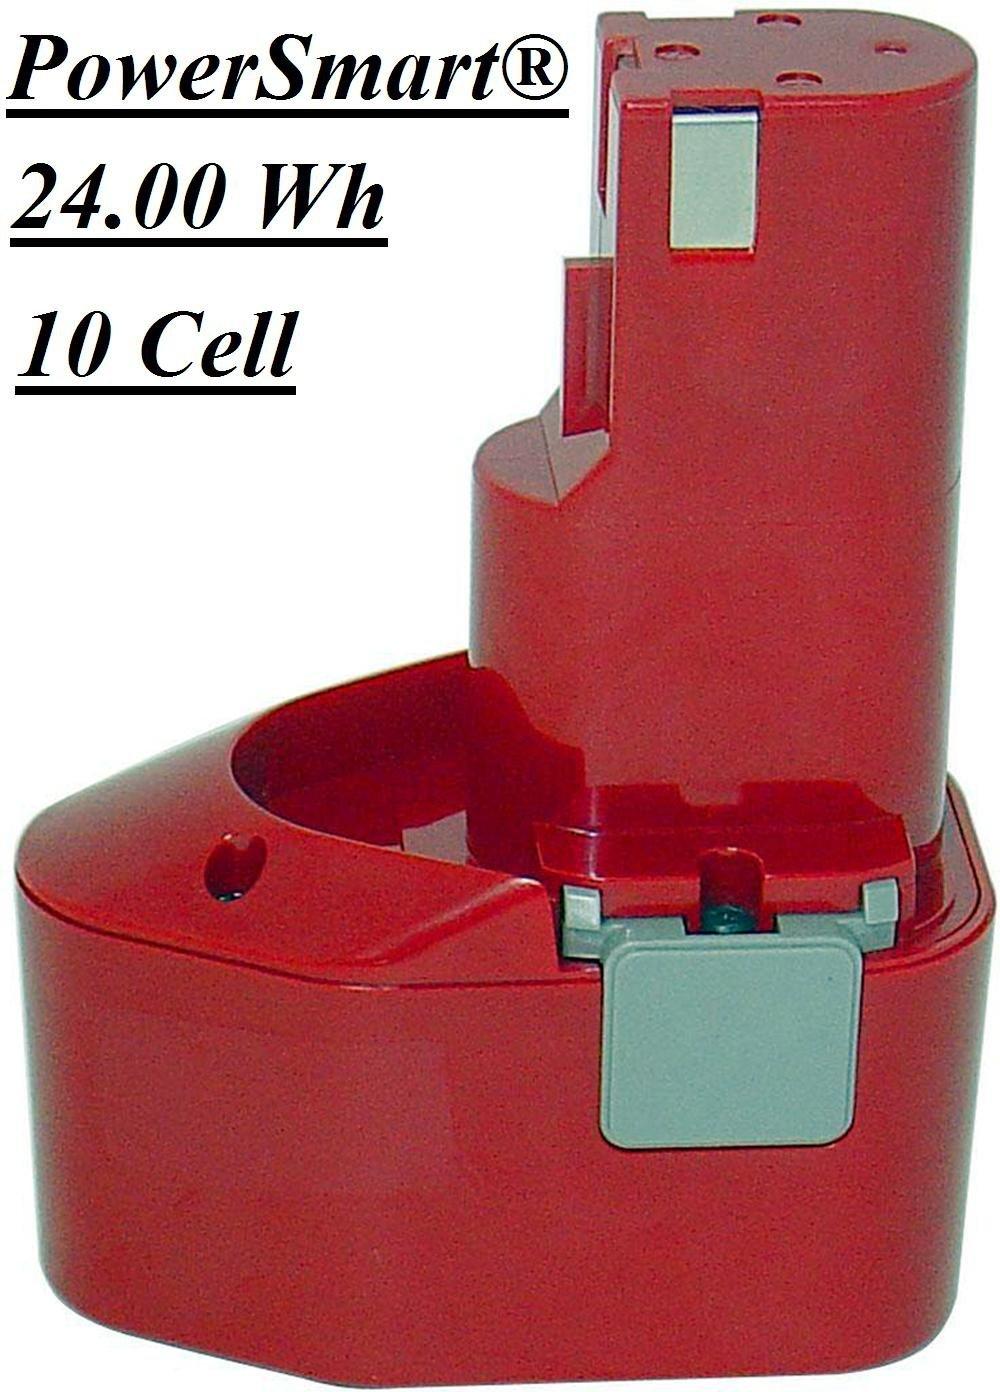 PowerSmart 12-Volt 2.0Ah Ni-Cd Battery for Milwaukee 48-11-0140, 48-11-0141, 48-11-0200, 48-11-0251